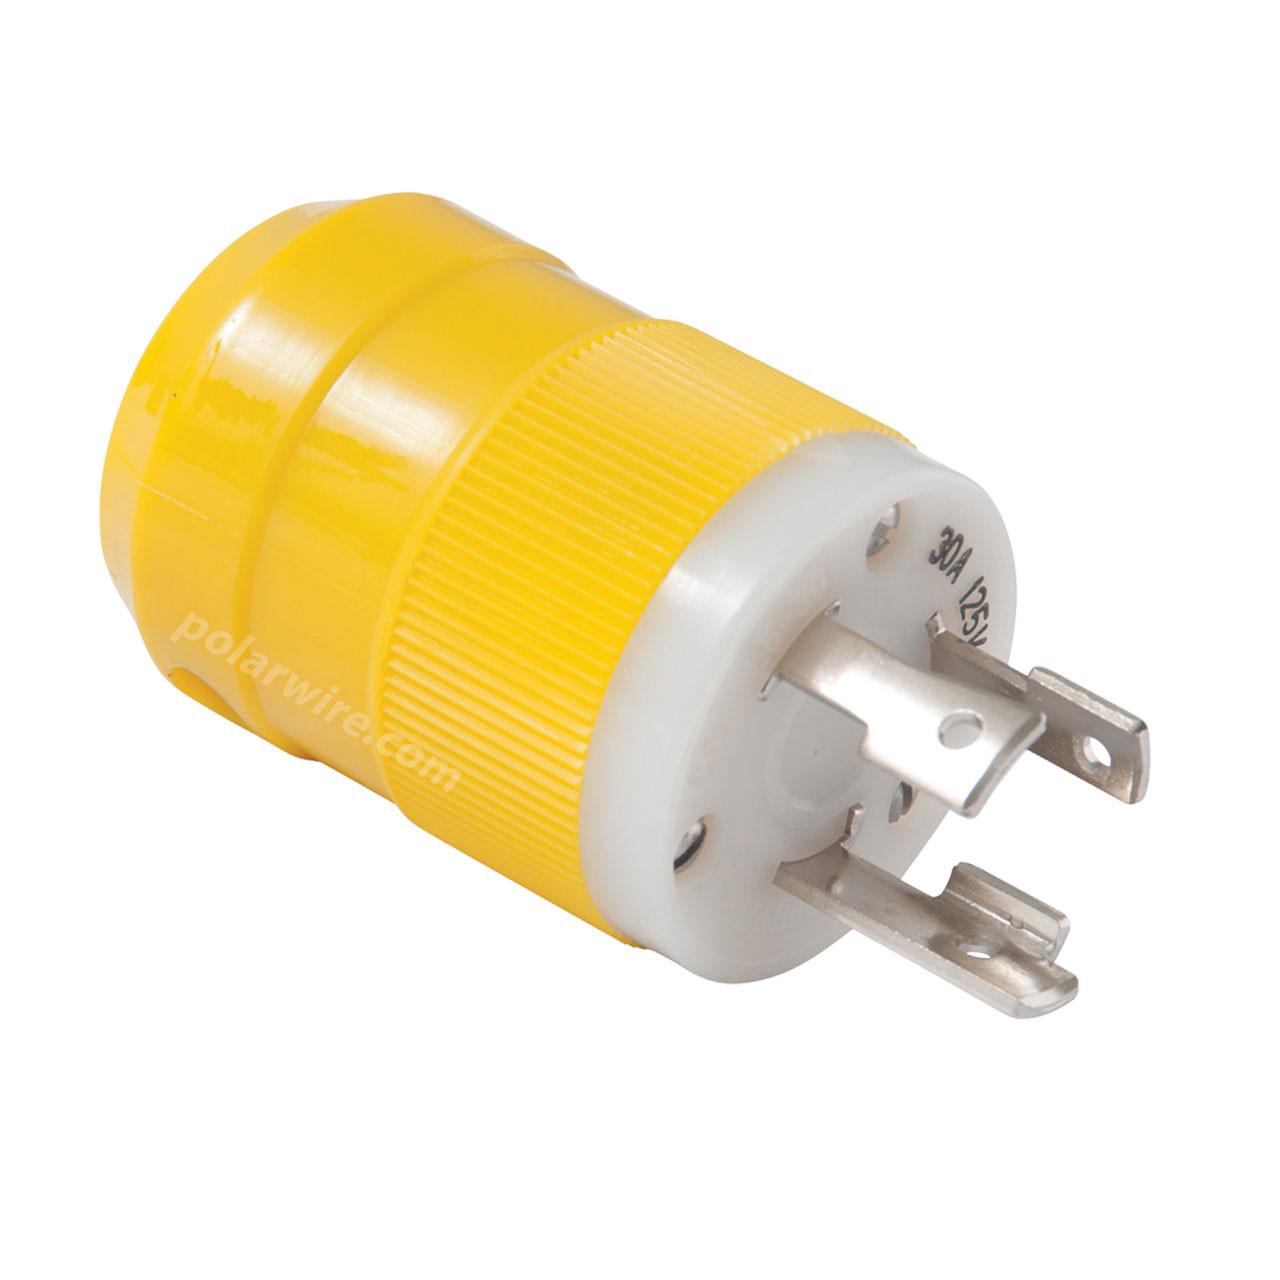 30A 125V Locking Blade Male Shore Power Plug